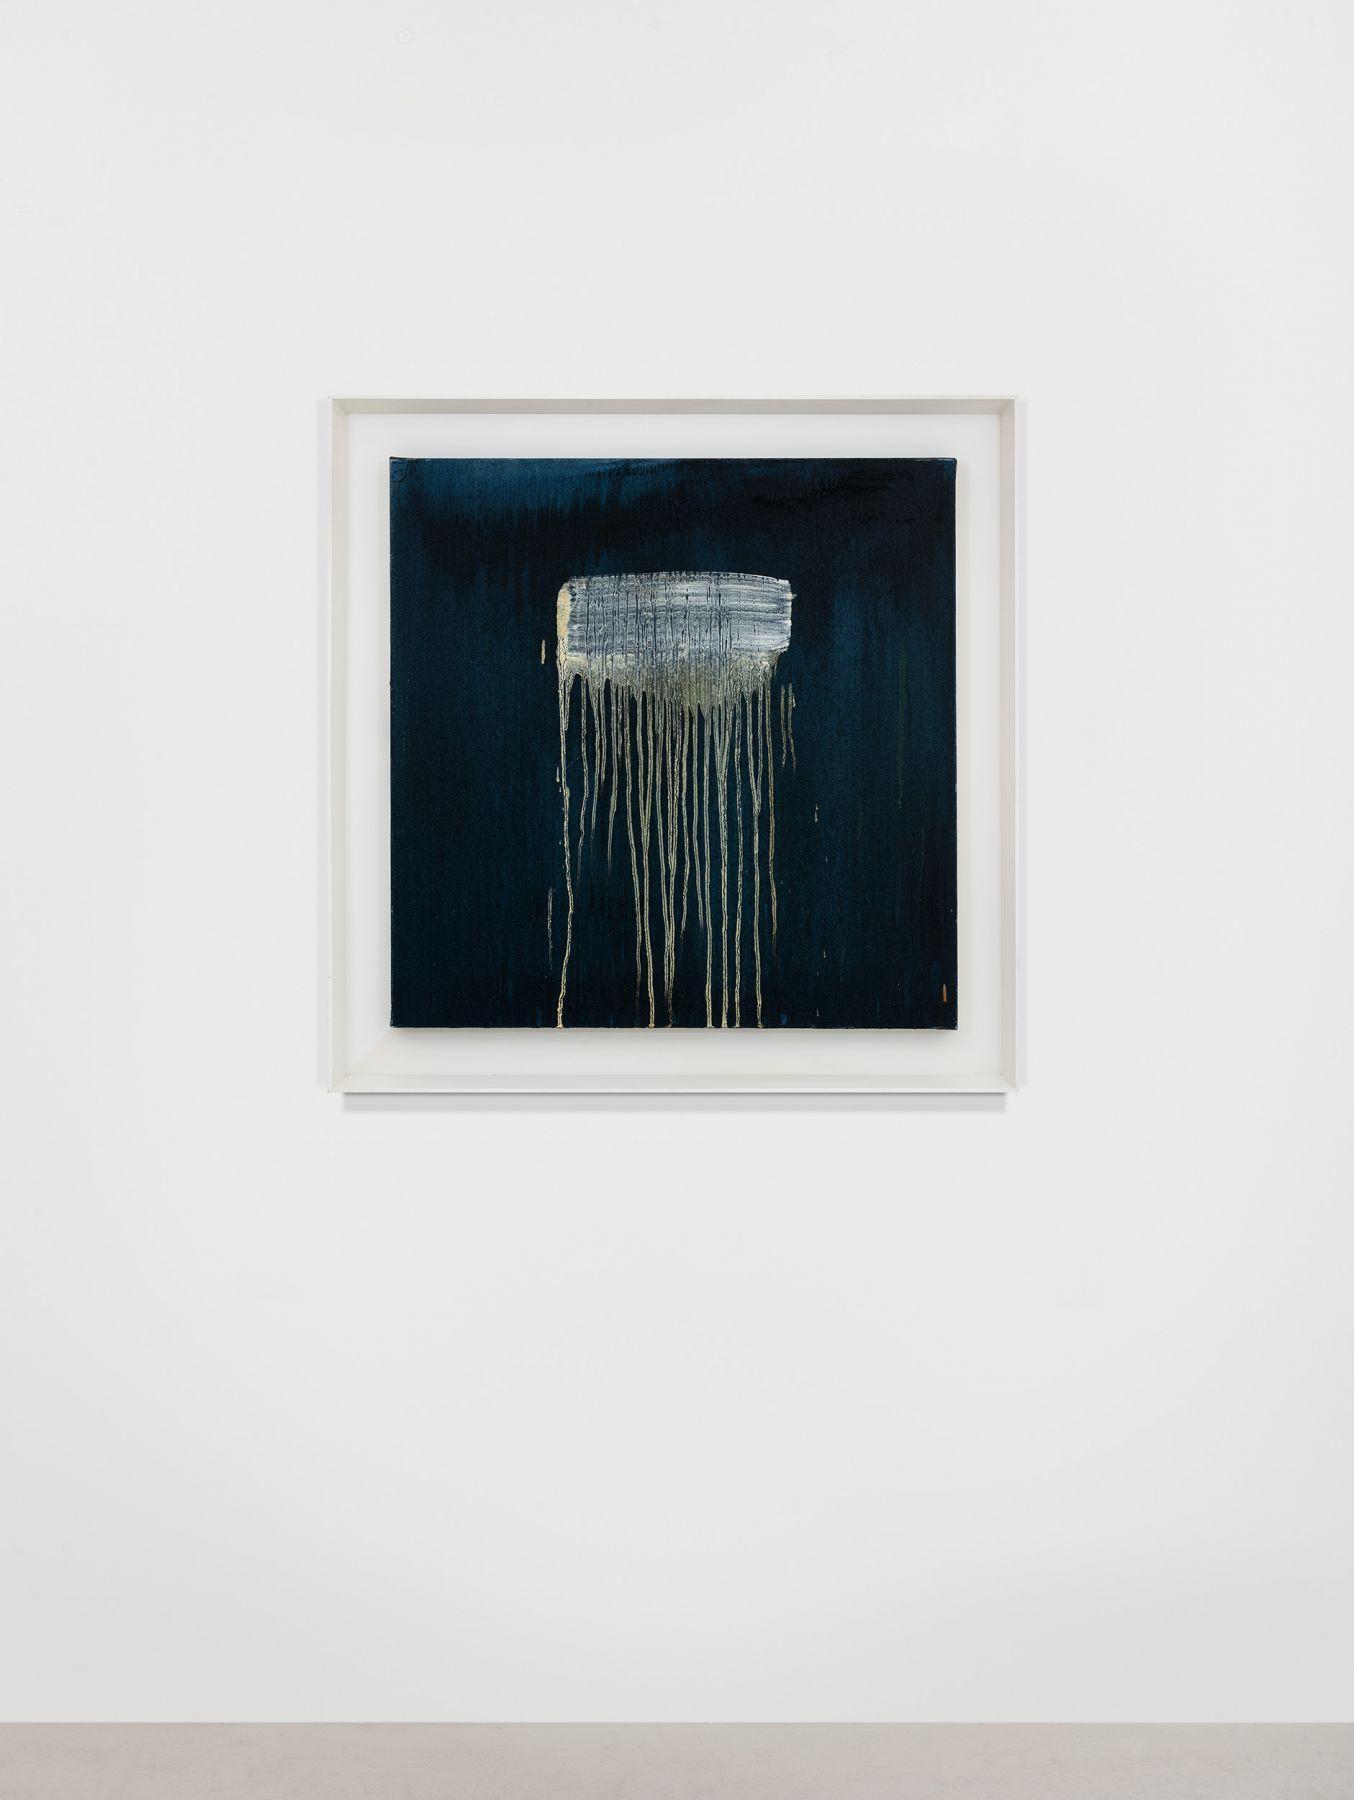 Pat Steir - Installation Image